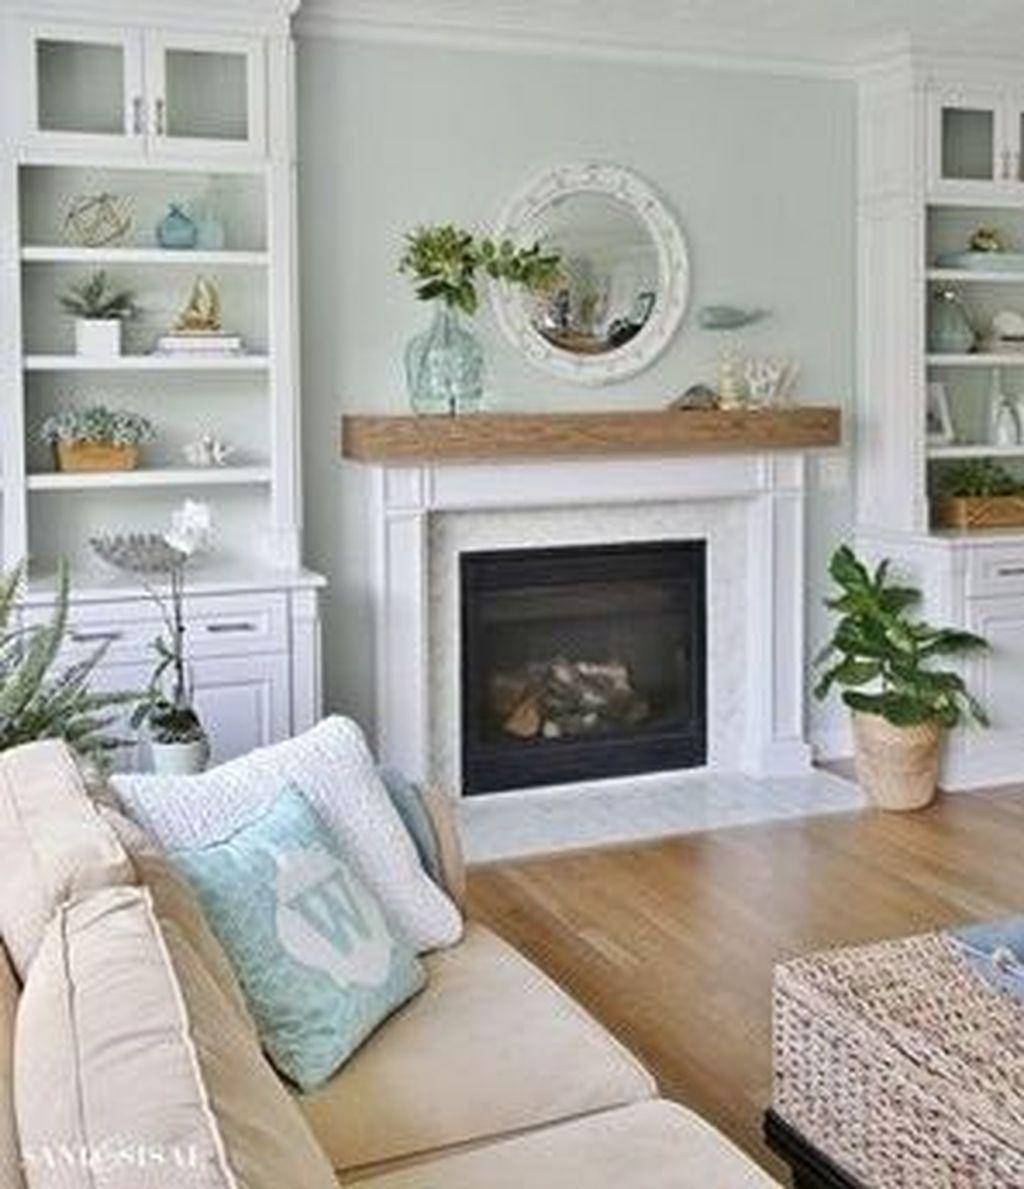 Best Minimalist Living Room Decorations Ideas 26